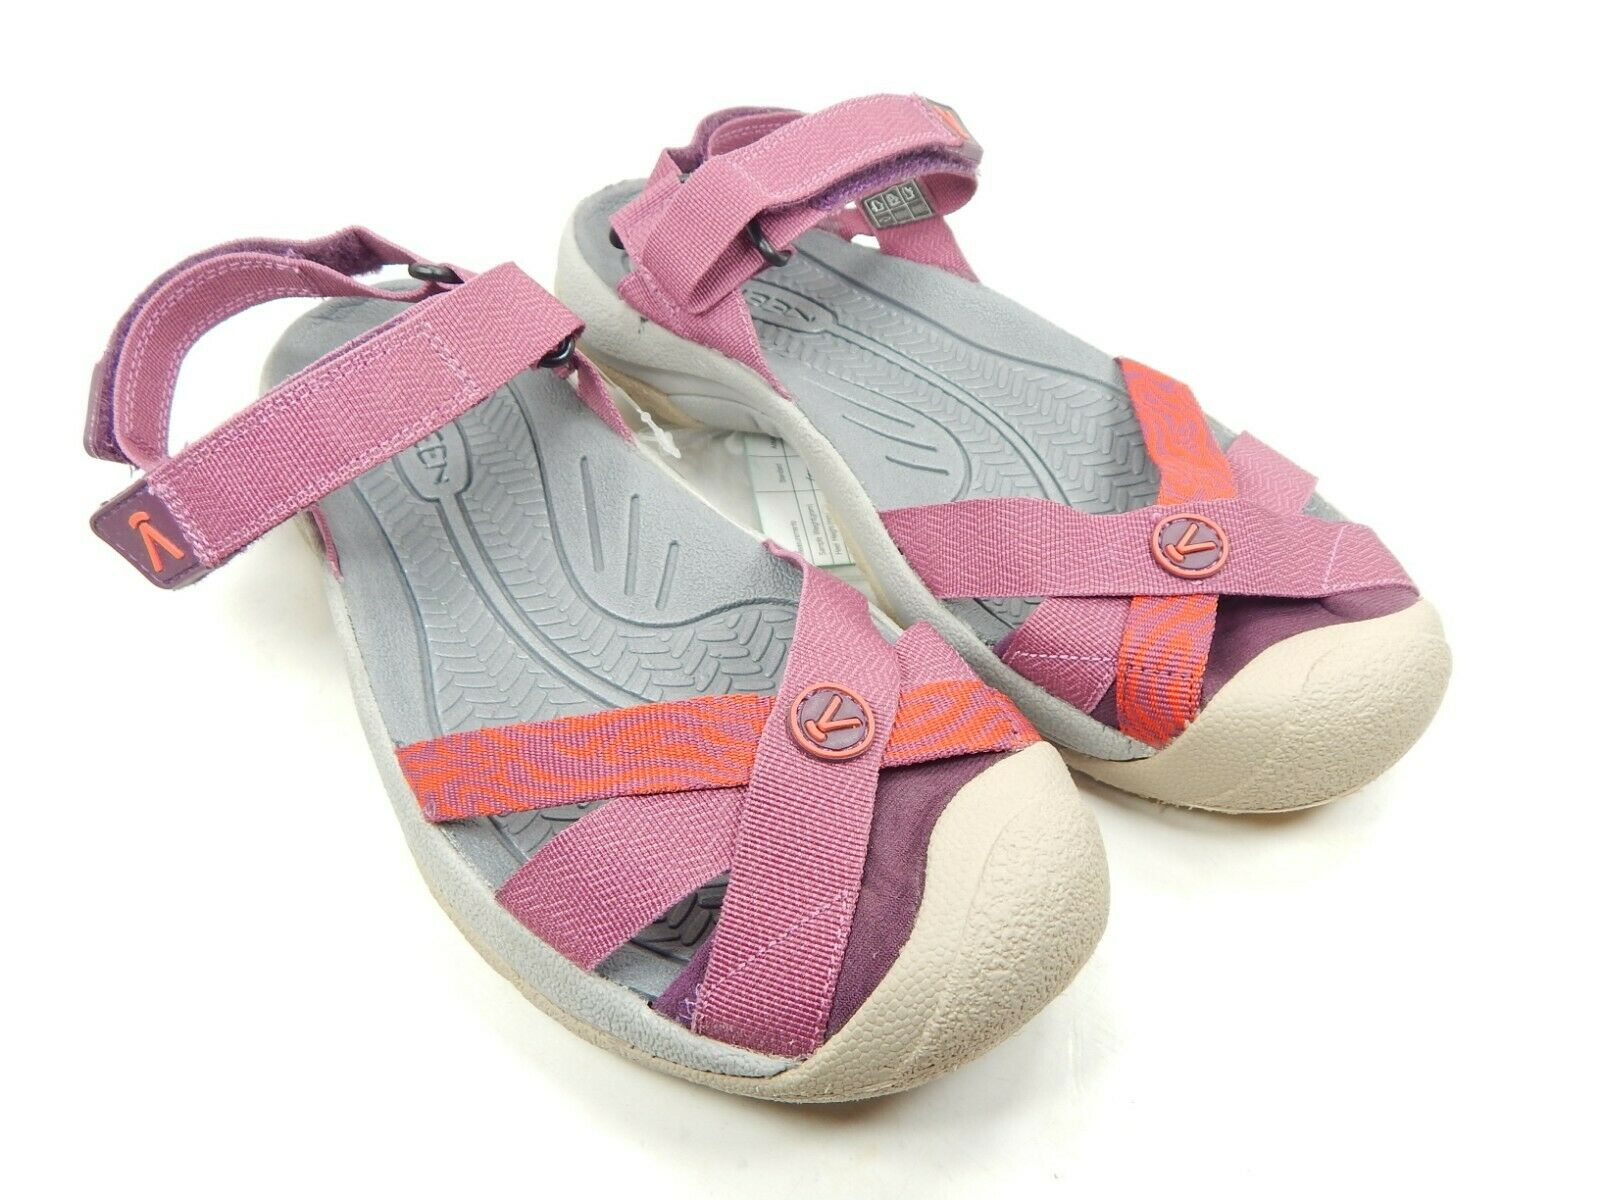 Keen Bali Handschlaufe Größe US 7 M (B) Eu 37,5 Damen Außen Sandalen Schuhe